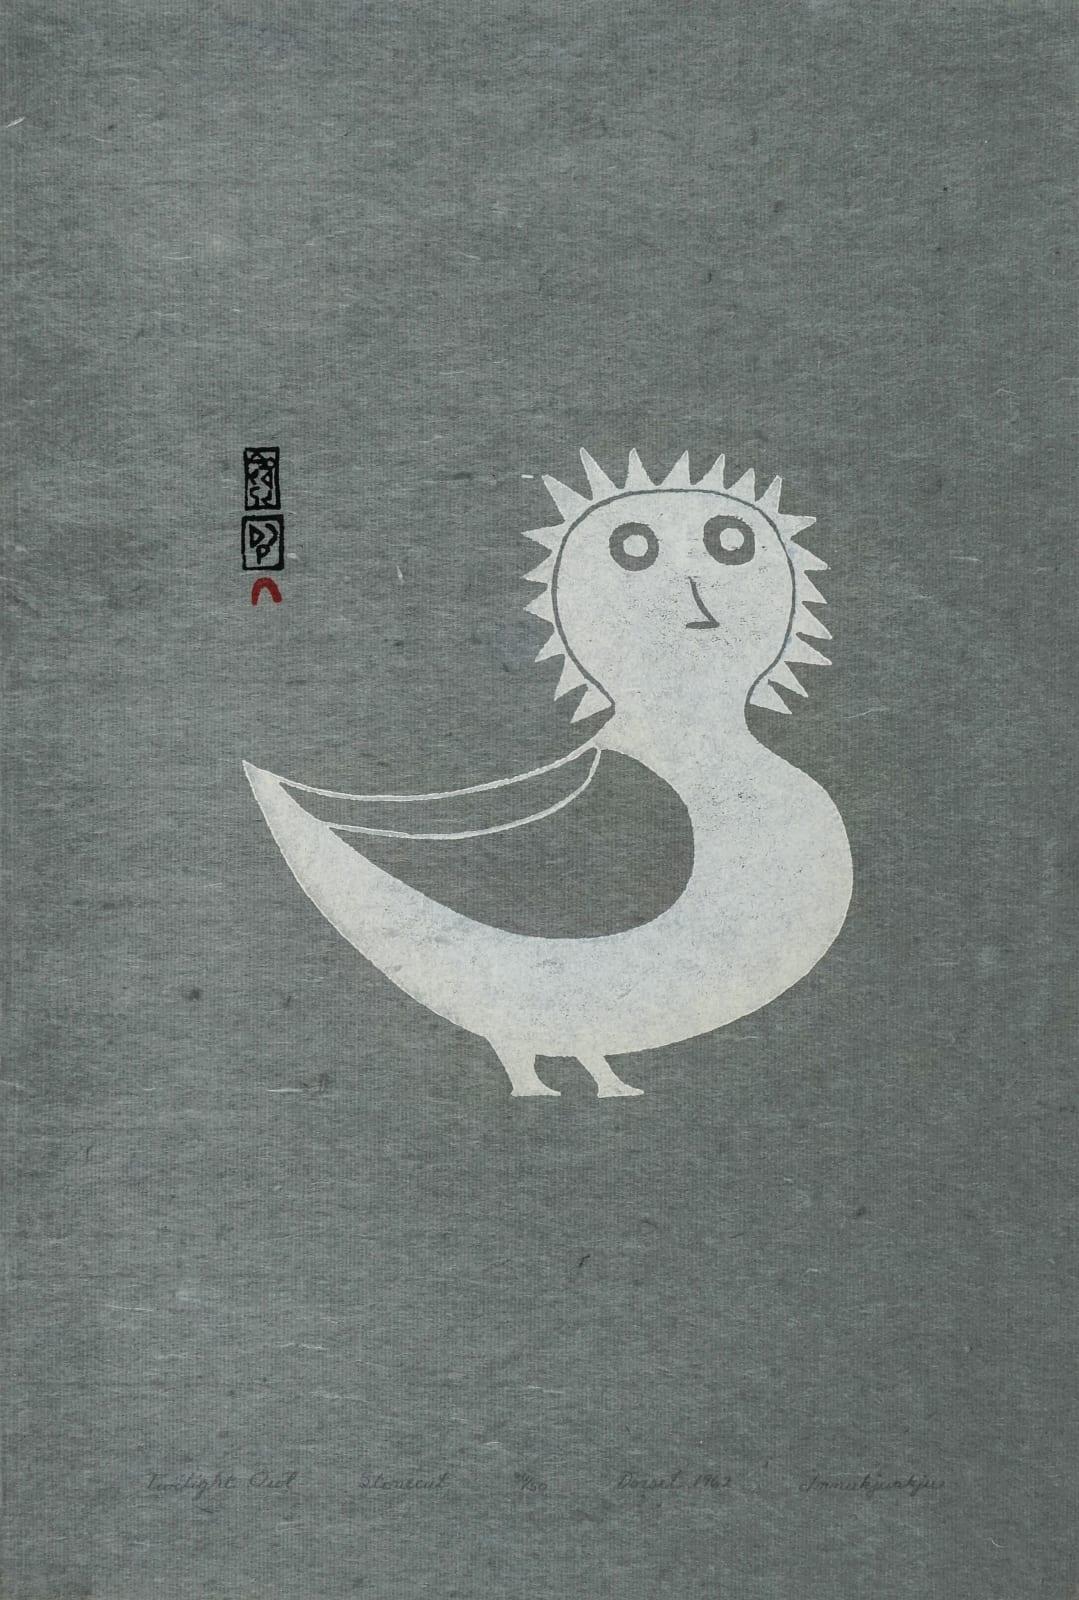 LOT 12 INNUKJUAKJU PUDLAT (1913-1972) KINNGAIT (CAPE DORSET) Twilight Owl, 1962 (1999) stonecut on grey paper, 18 1/2 x 12 1/2 in (47 x 31.8 cm) ESTIMATE: $ 1,000— $1,500